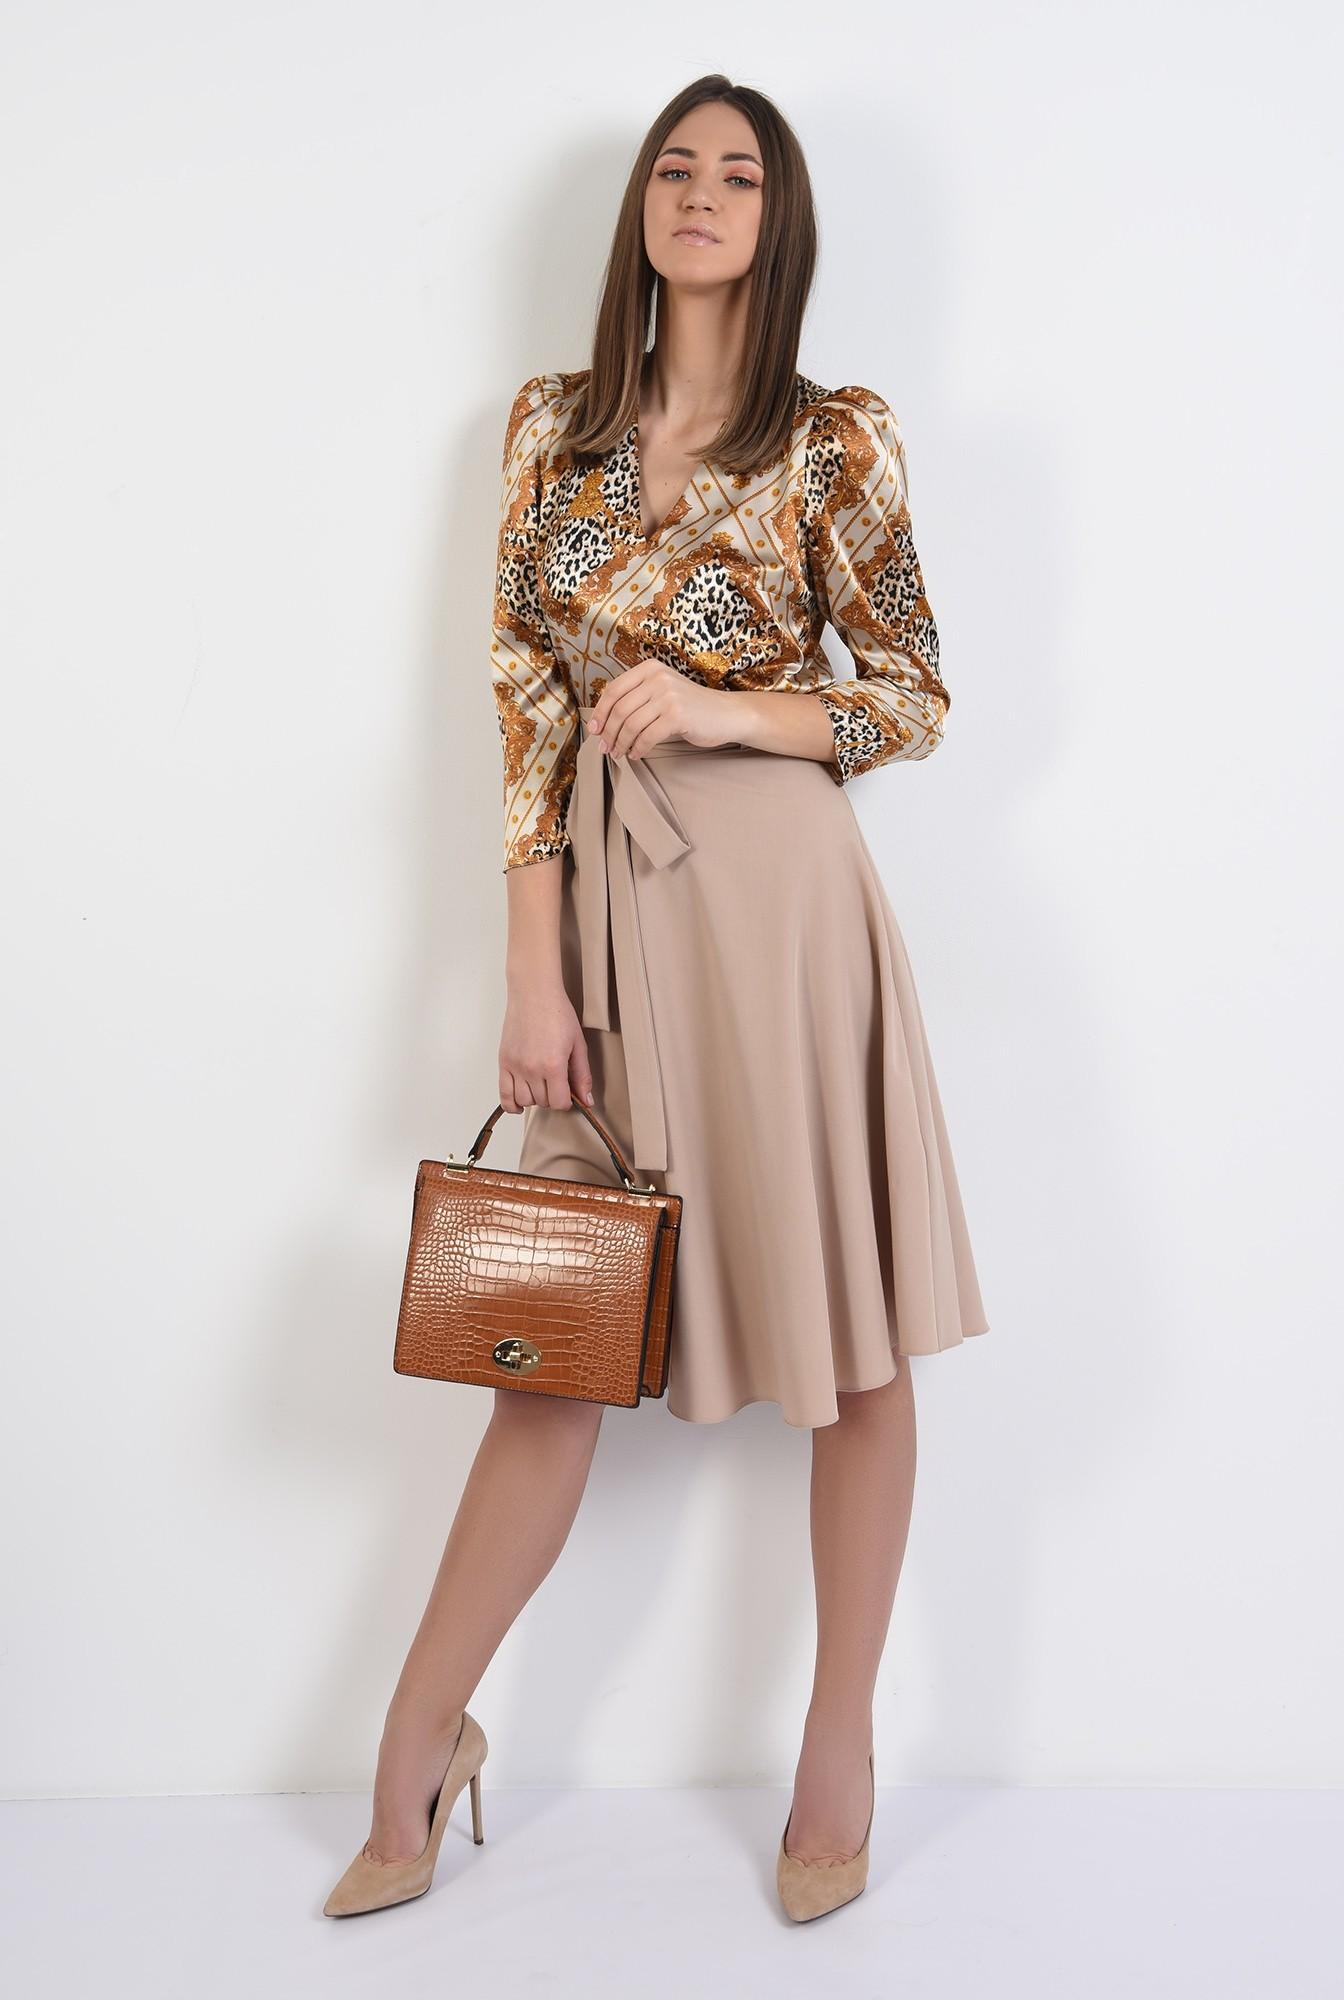 3 - bluza eleganta, din satin, cu imprimeu, animal print, bluza de primavara